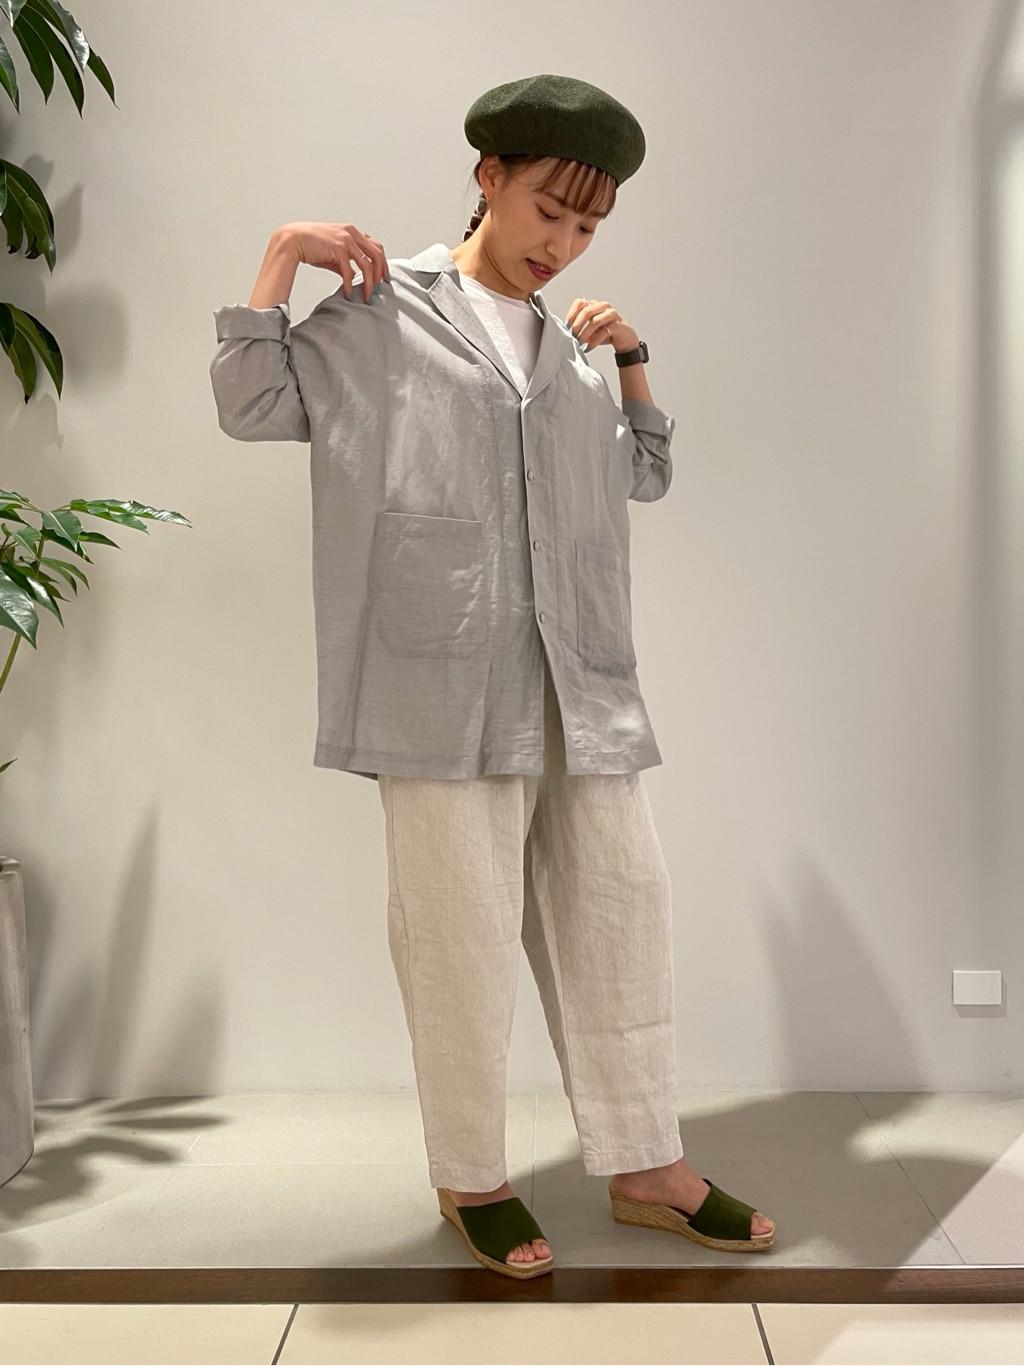 yuni 二子玉川rize 身長:164cm 2021.04.23